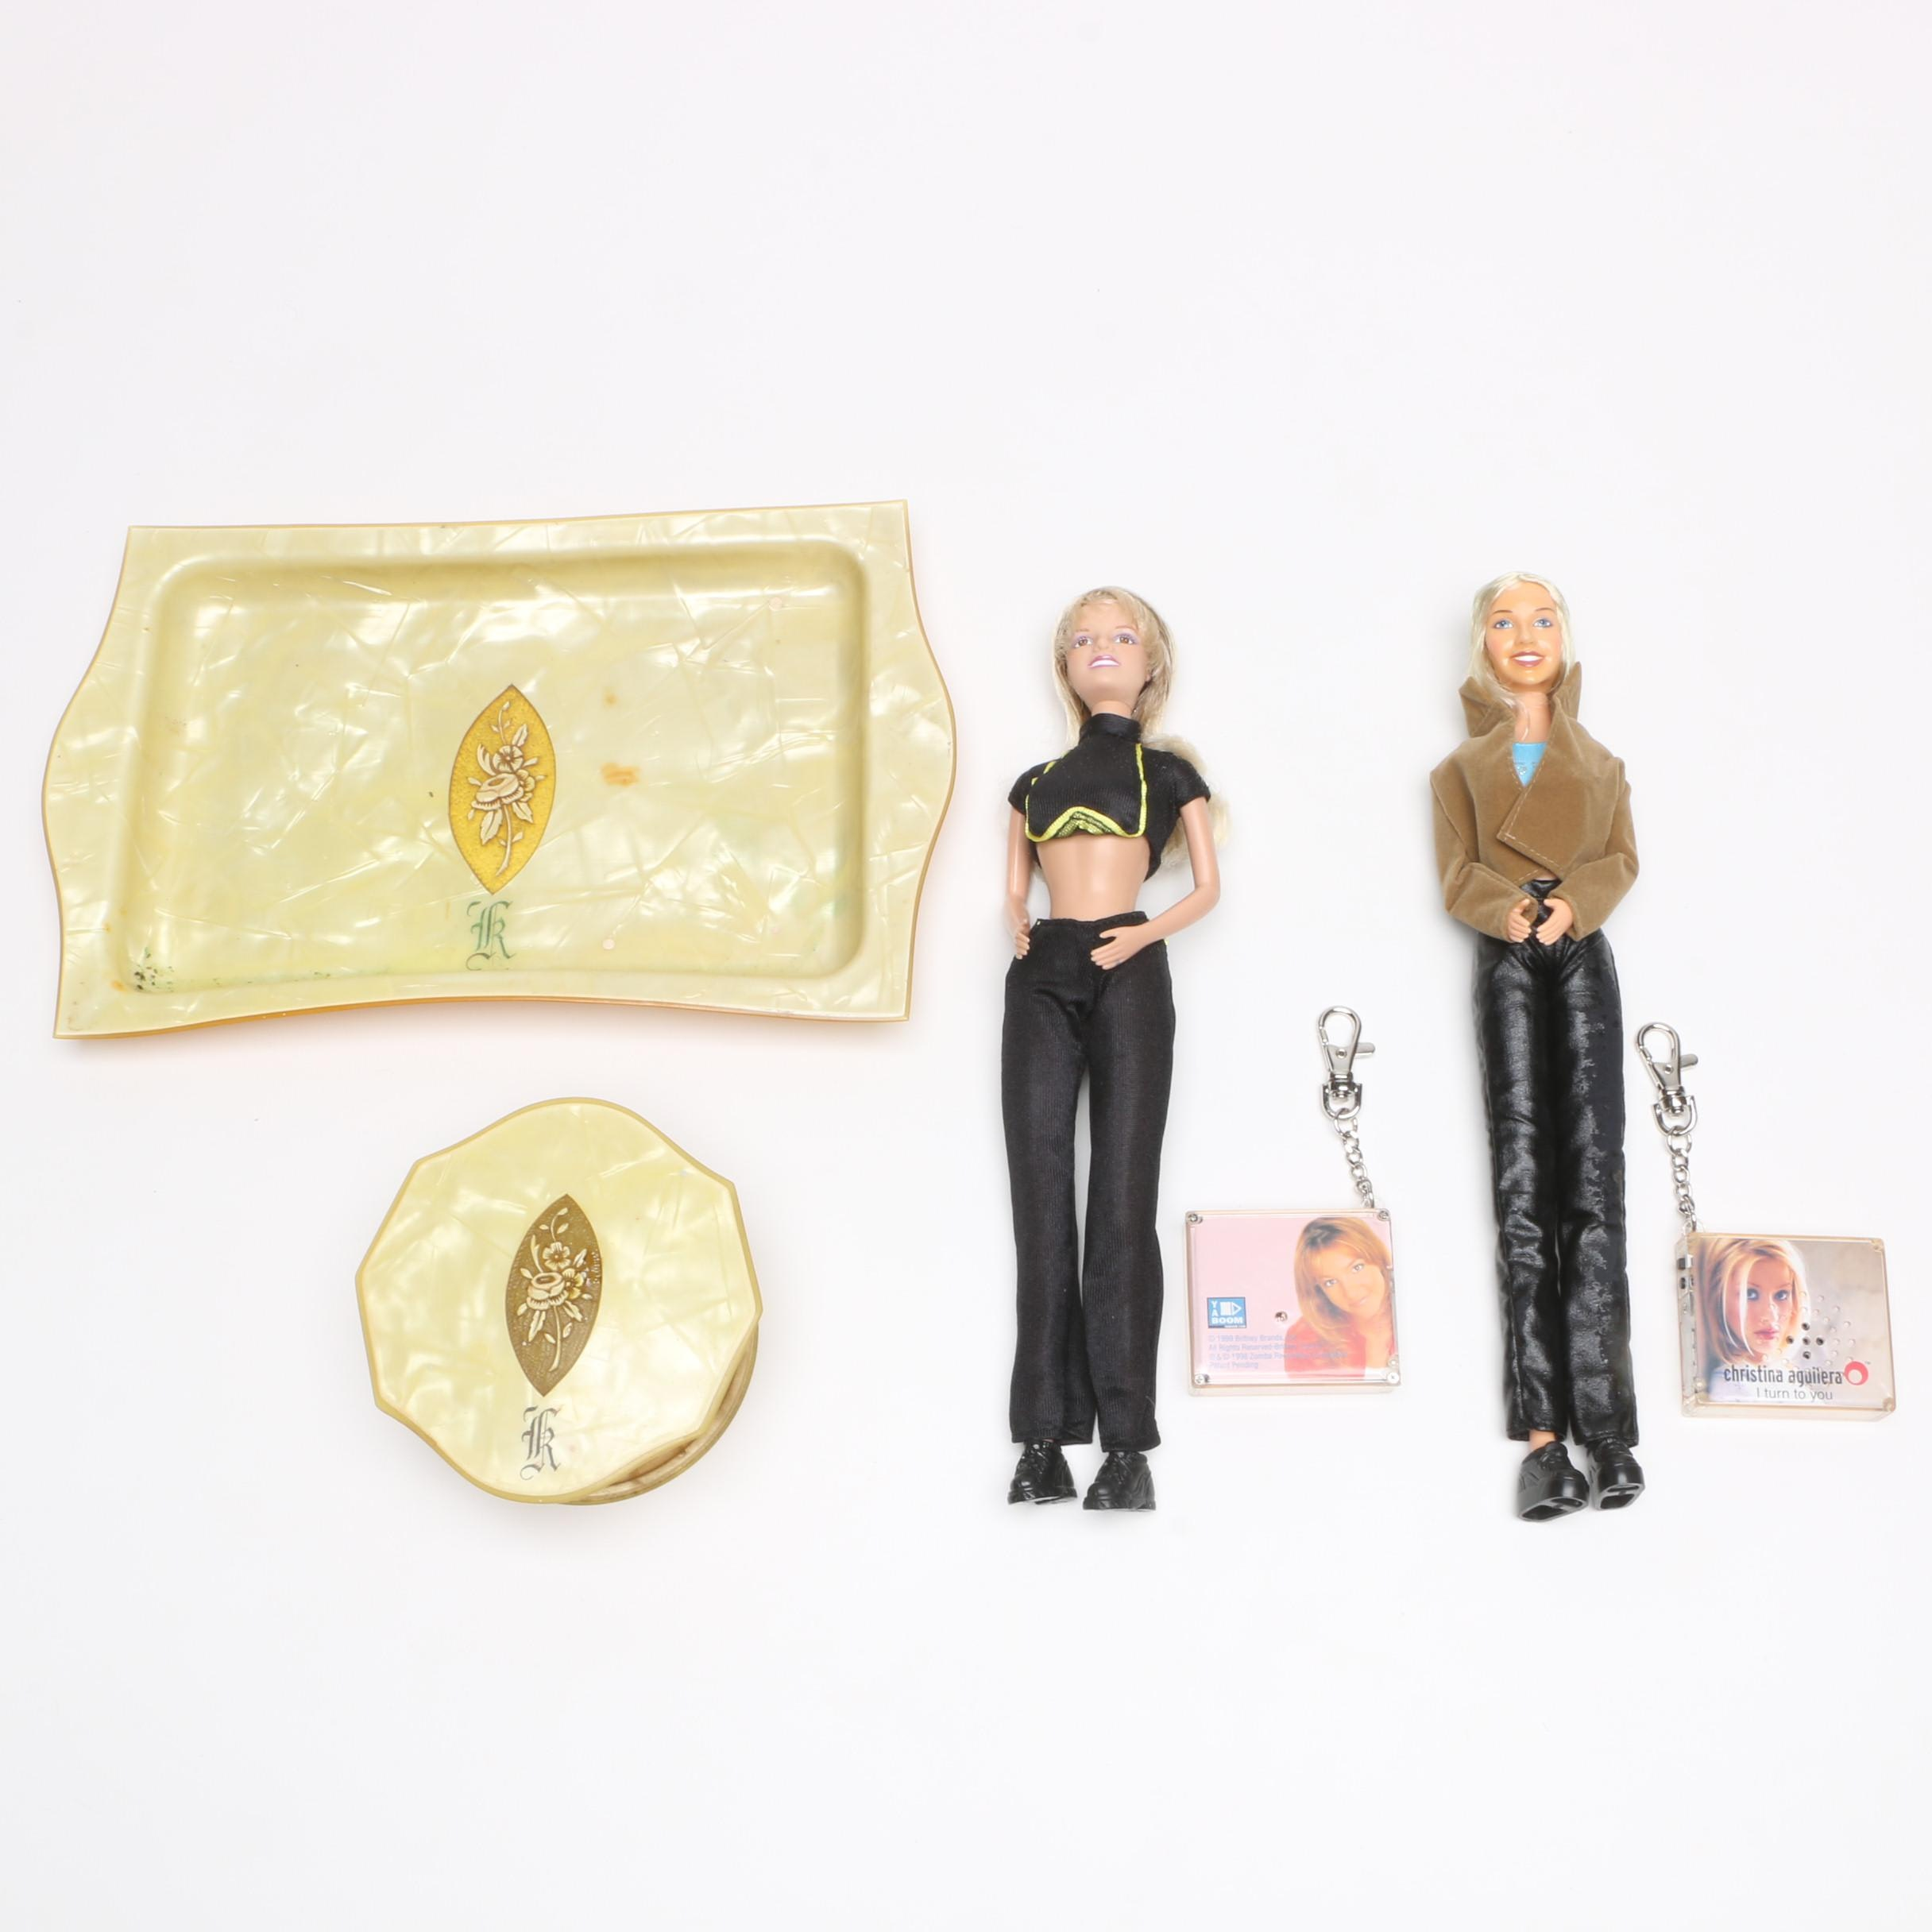 Vintage Celluloid Trinket Box Set and Two Popstar Dolls